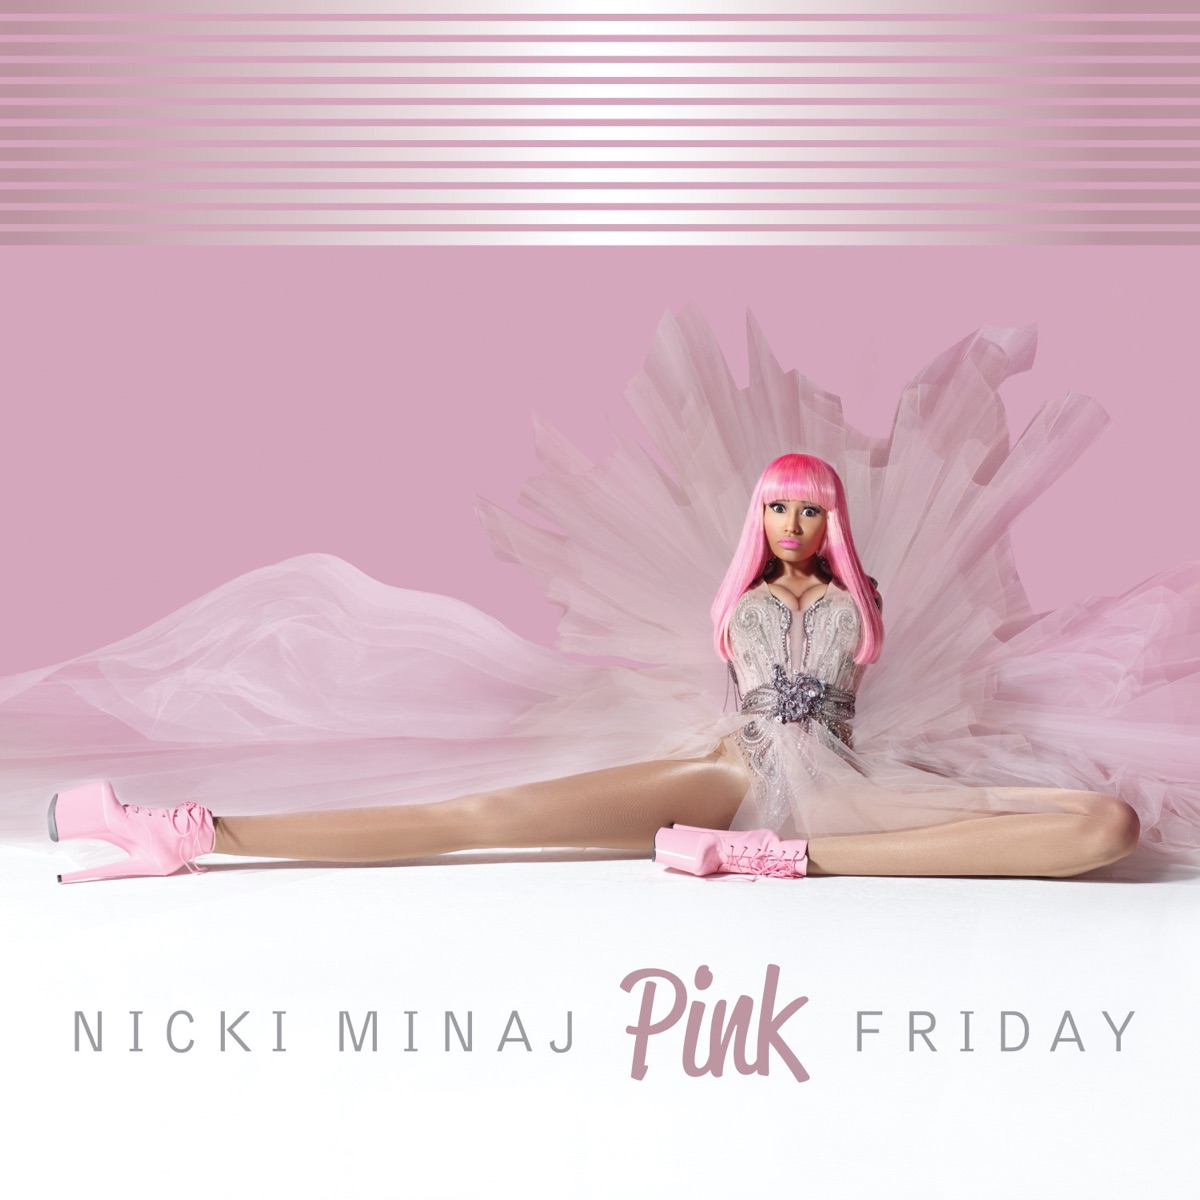 Pink Friday Nicki Minaj CD cover